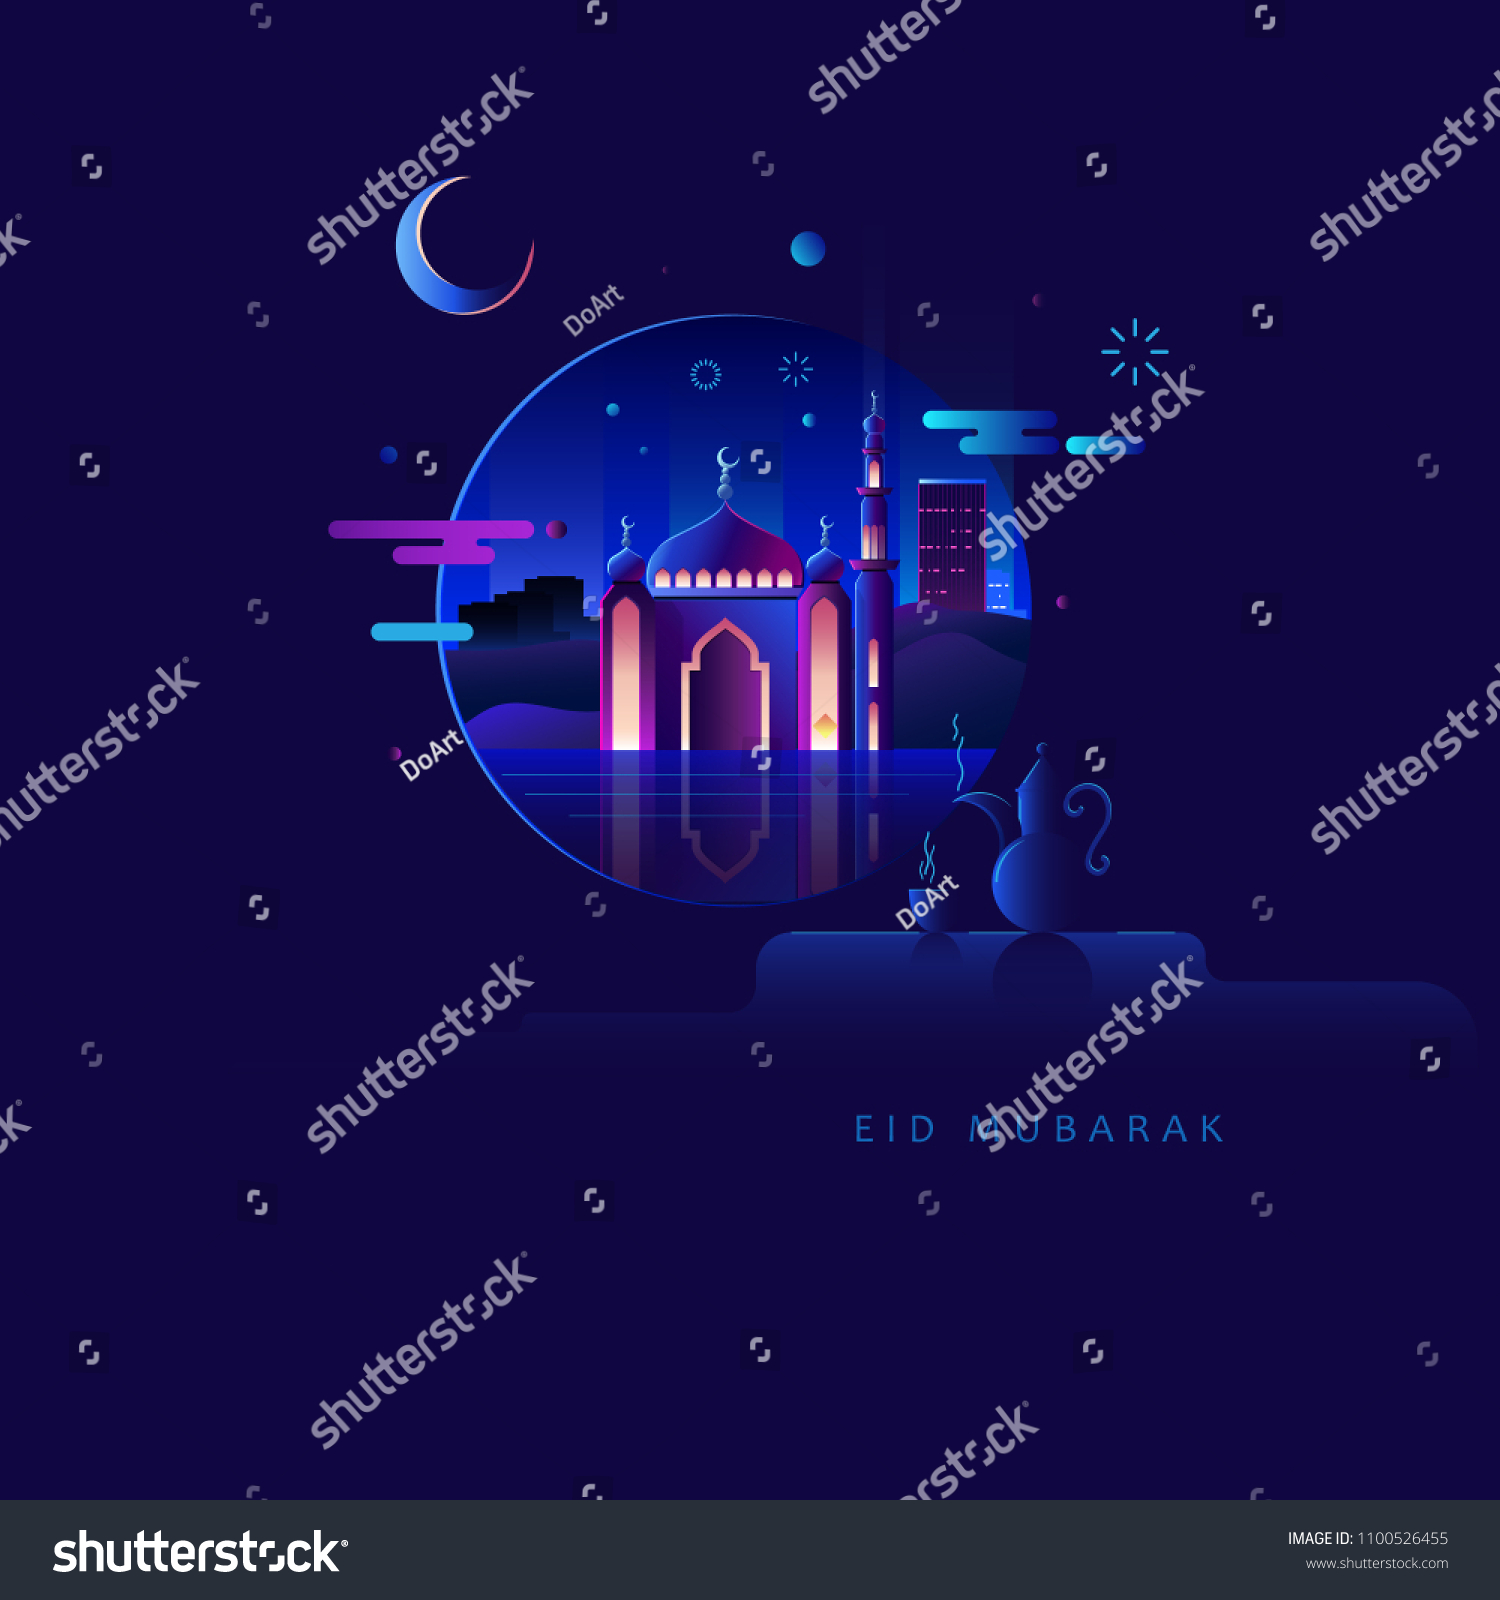 Eid Mubarak Flat Illustration Warm Dark Stock Illustration